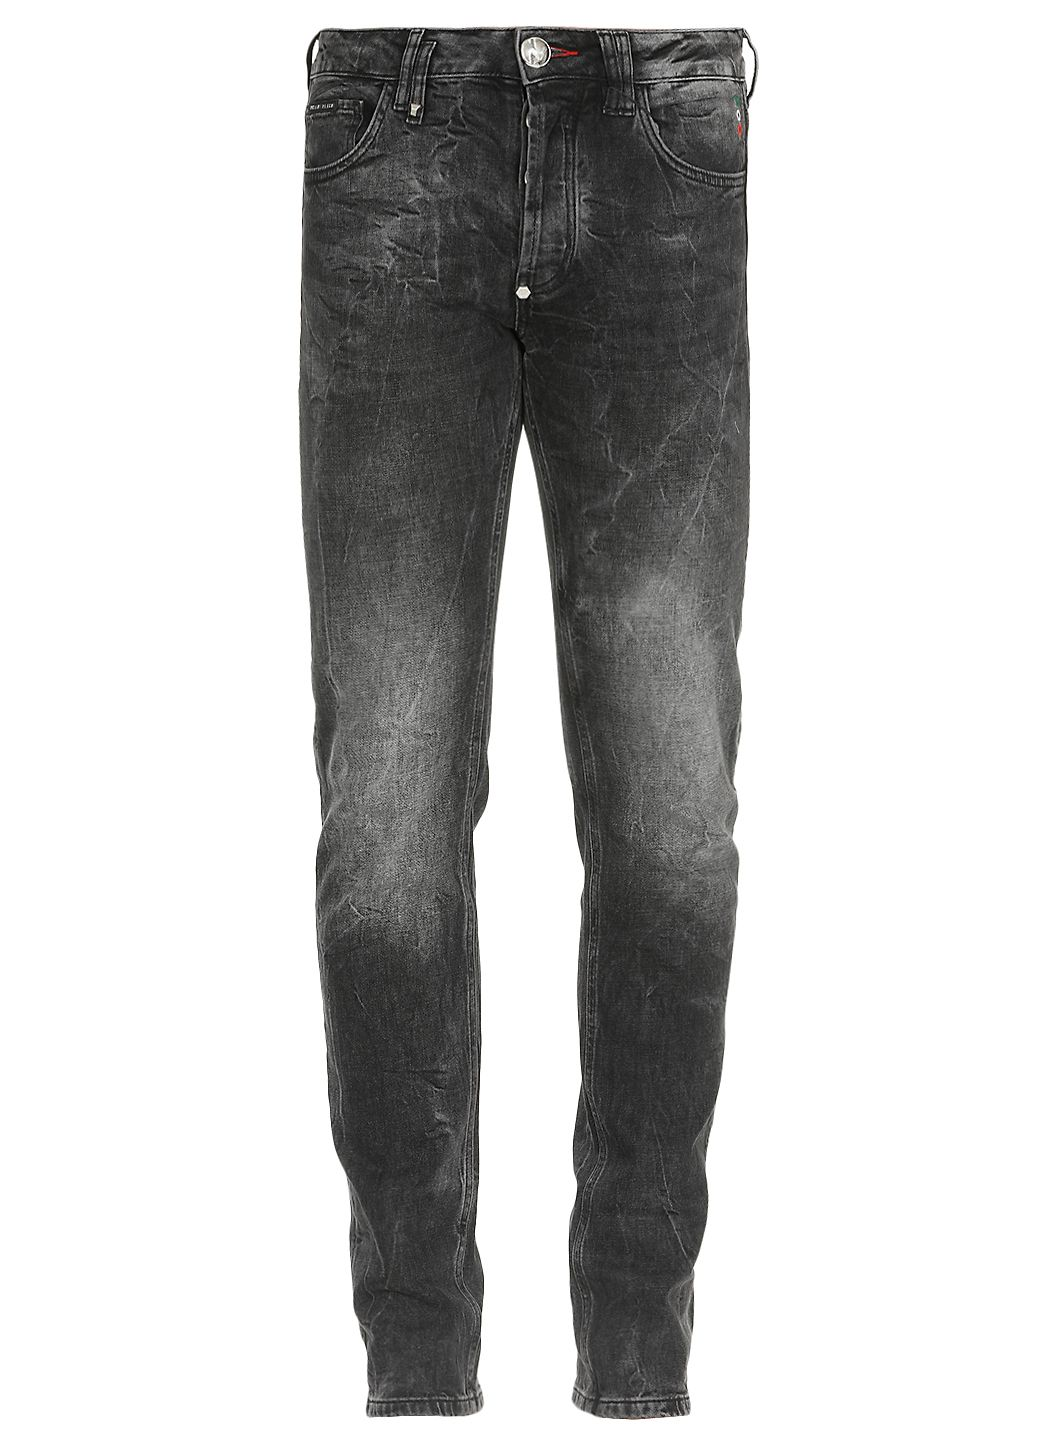 Super Straight Cut jeans